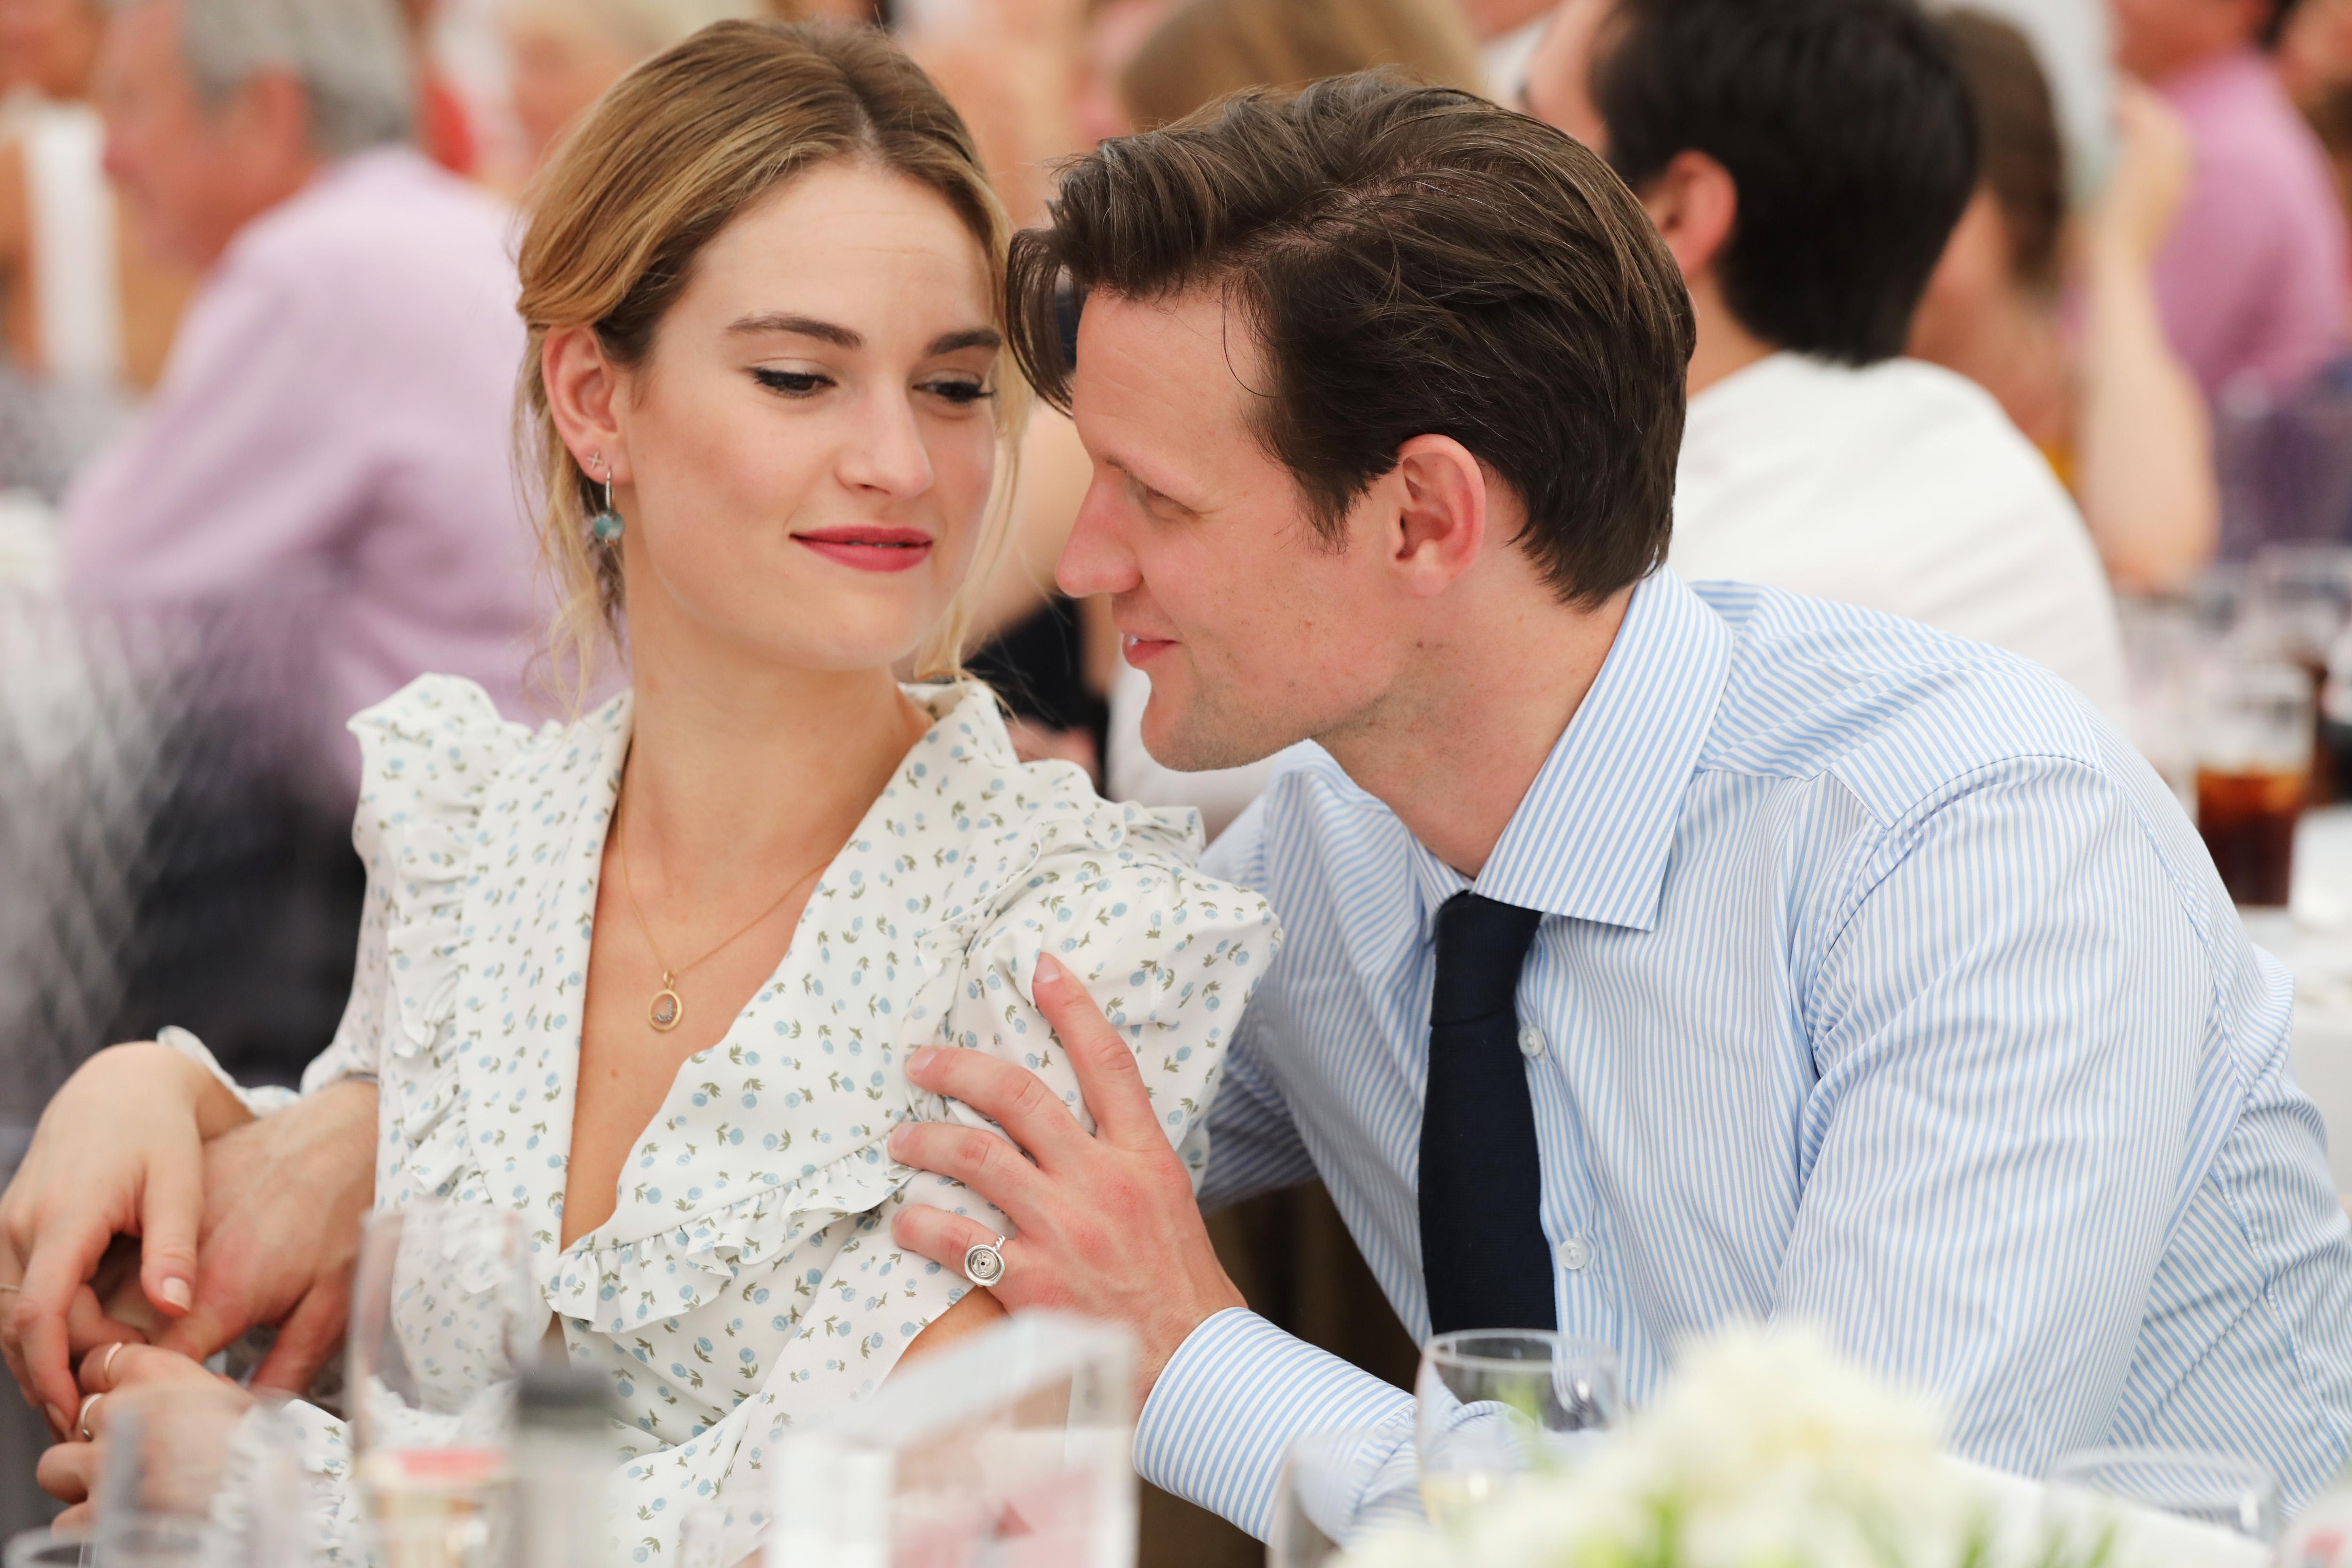 Lily och Jamie dating